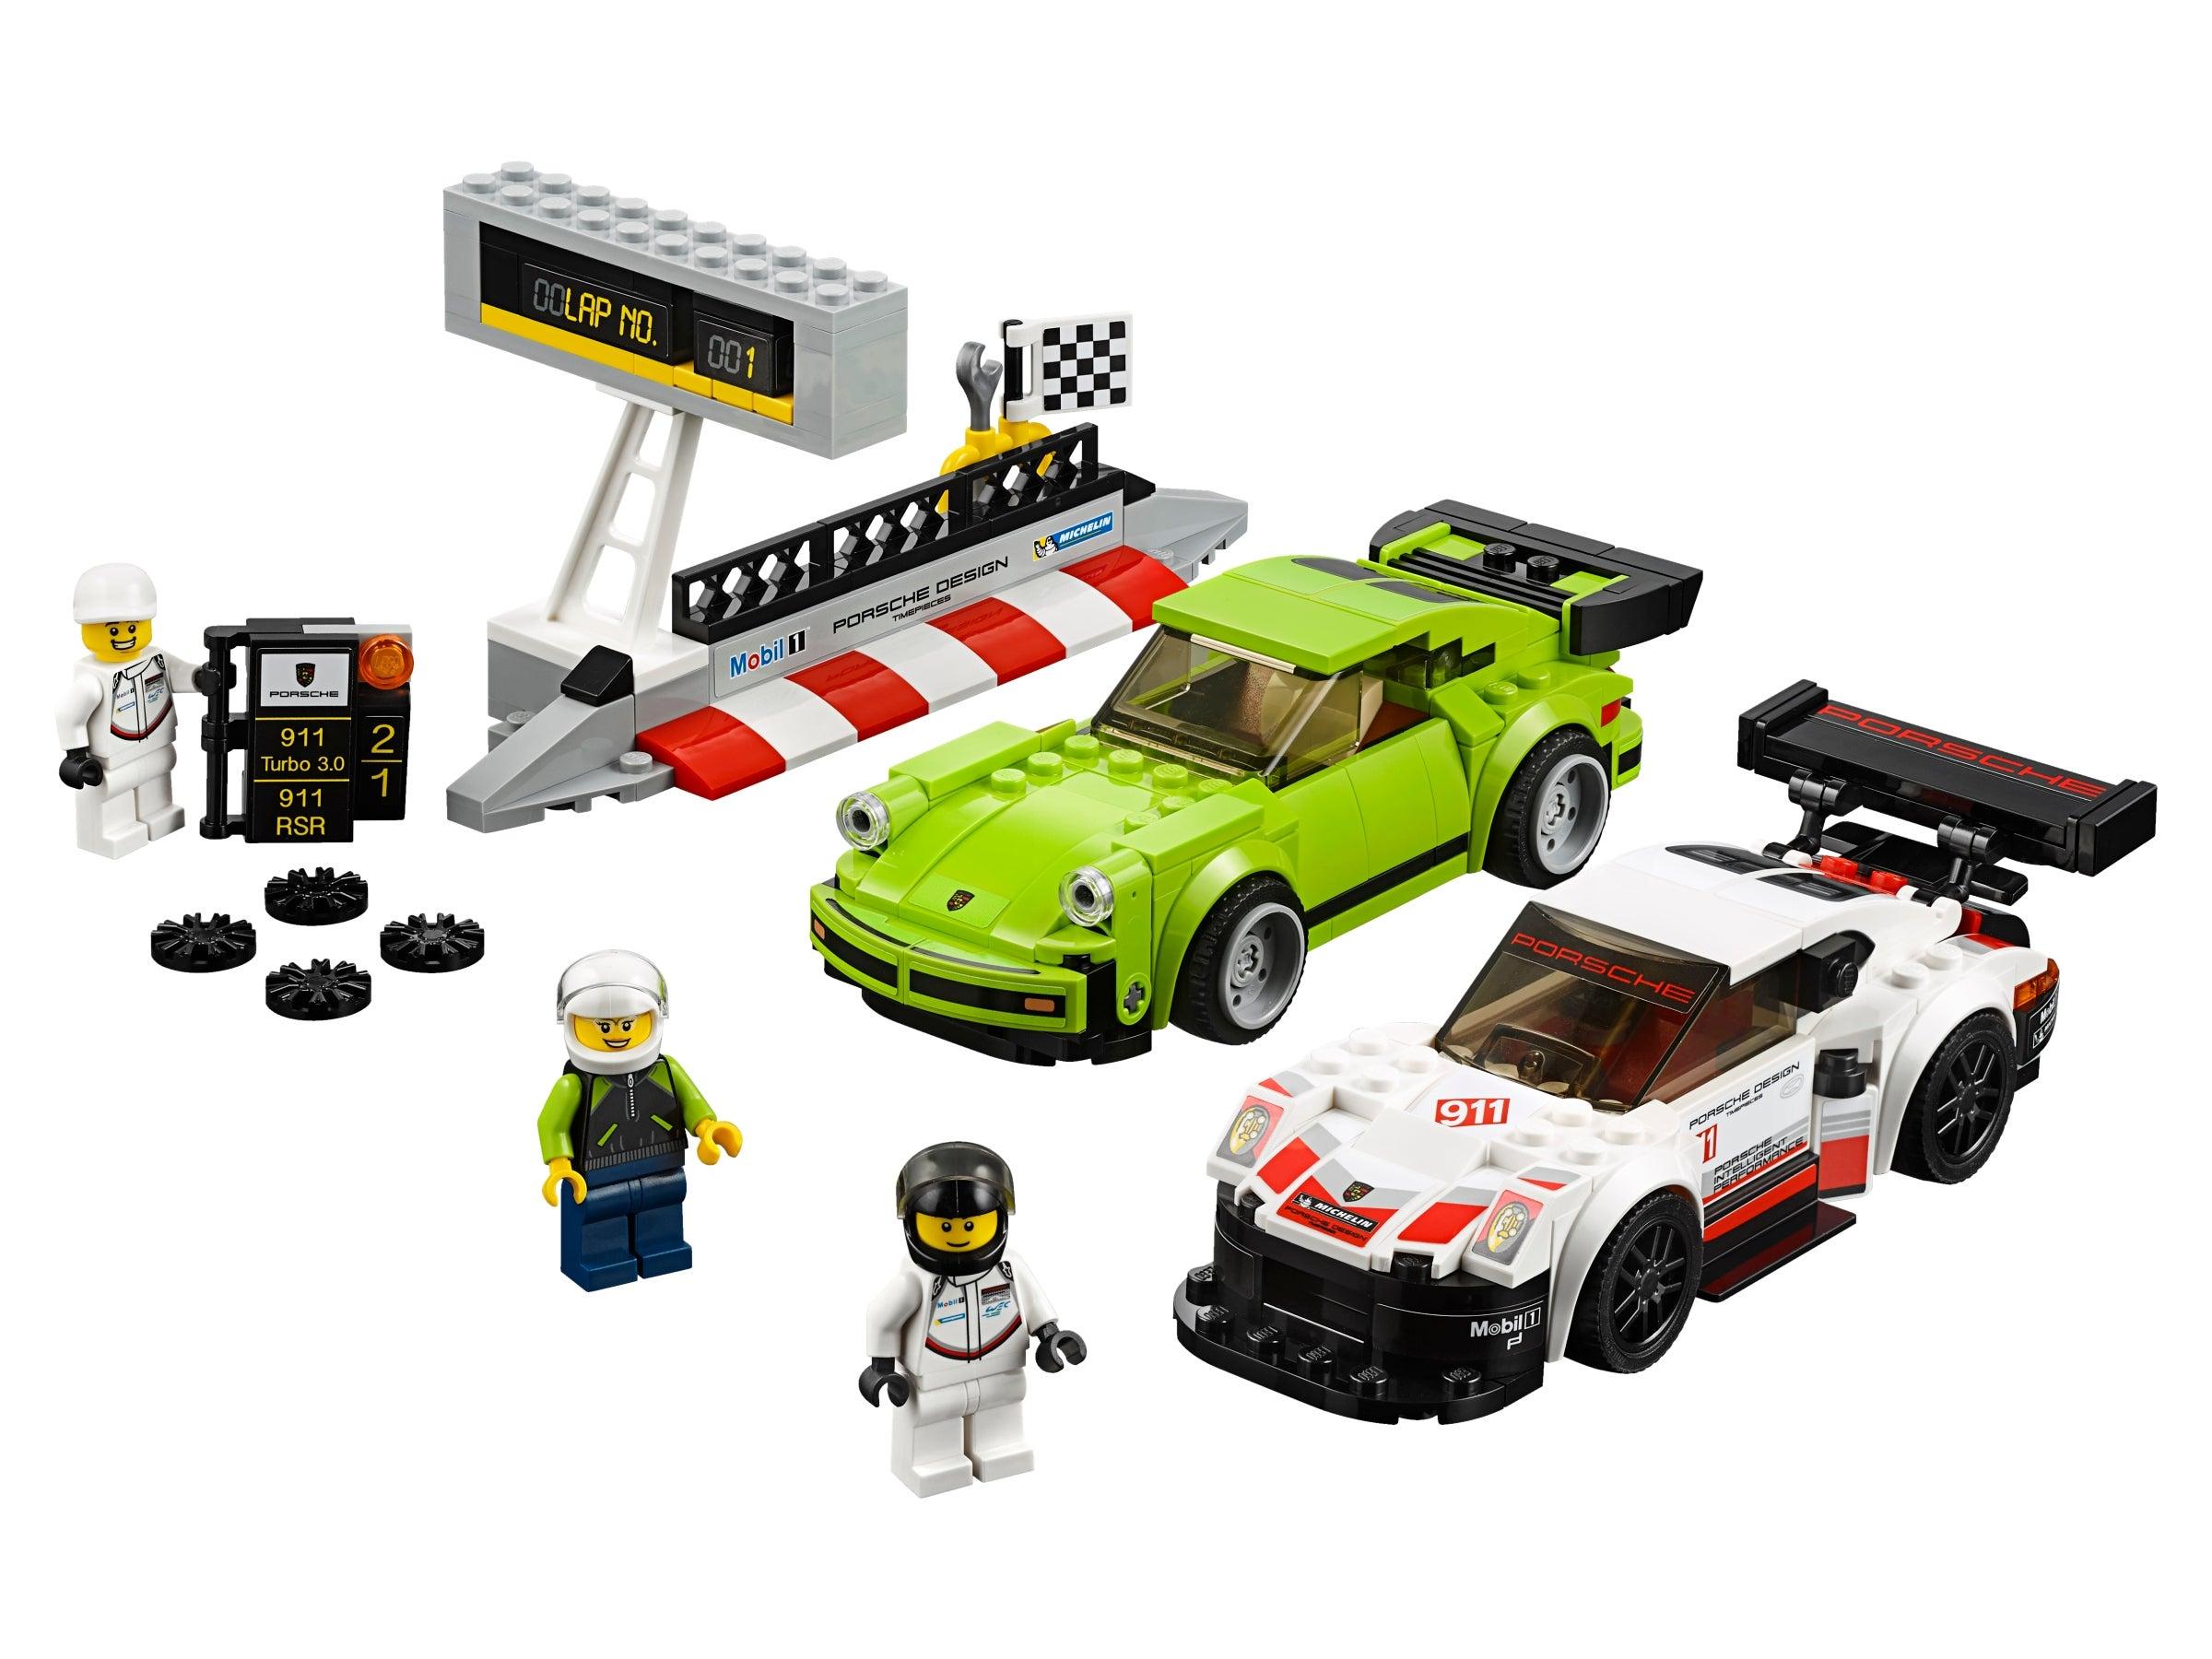 No sc078 LEGO Minifigure Speed Champions // Porsche 911 Turbo Driver QTY 1